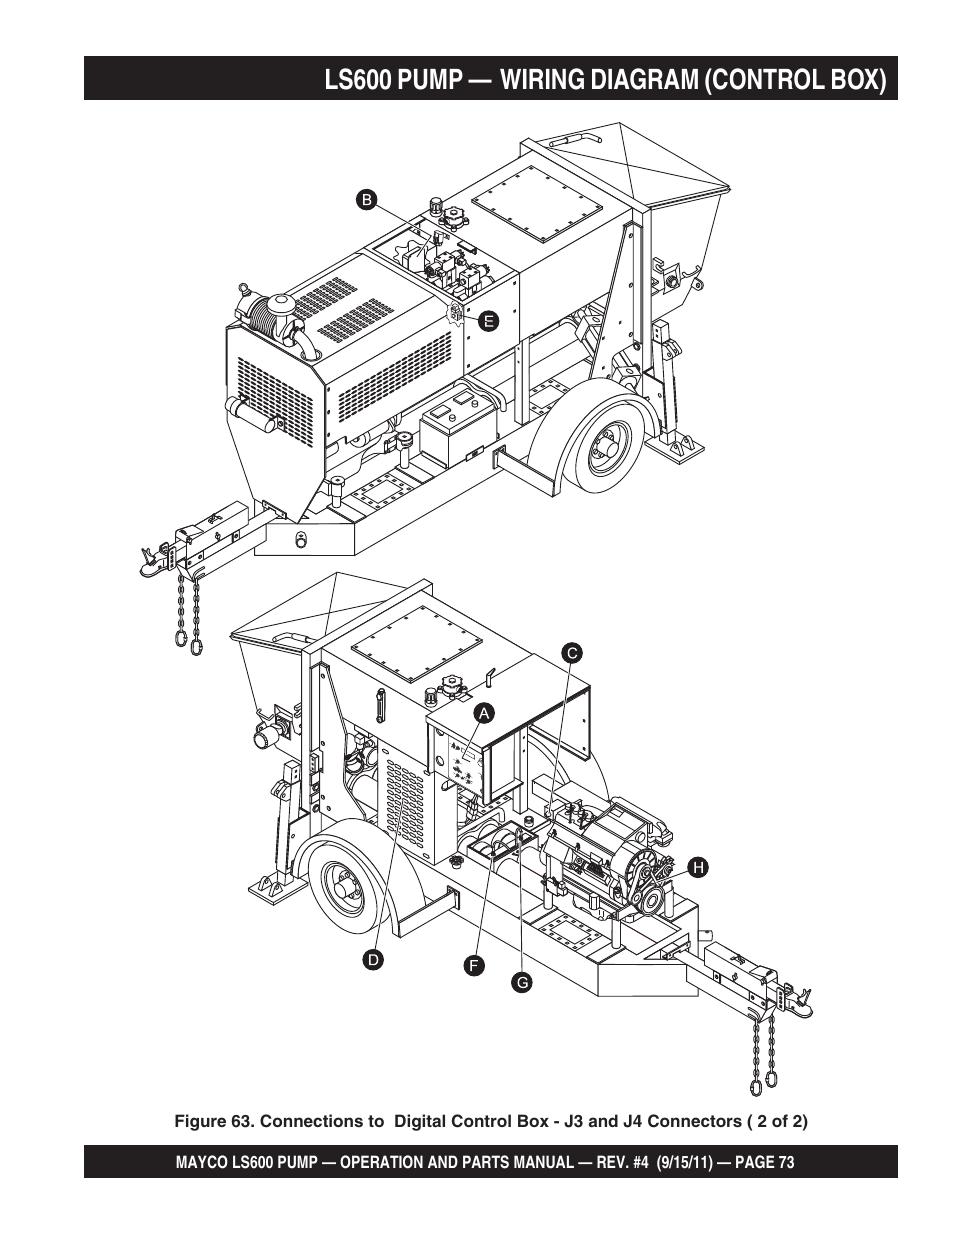 medium resolution of ls600 pump wiring diagram control box multiquip 220 well pump wiring diagram pump with pressure switch control box wiring diagram